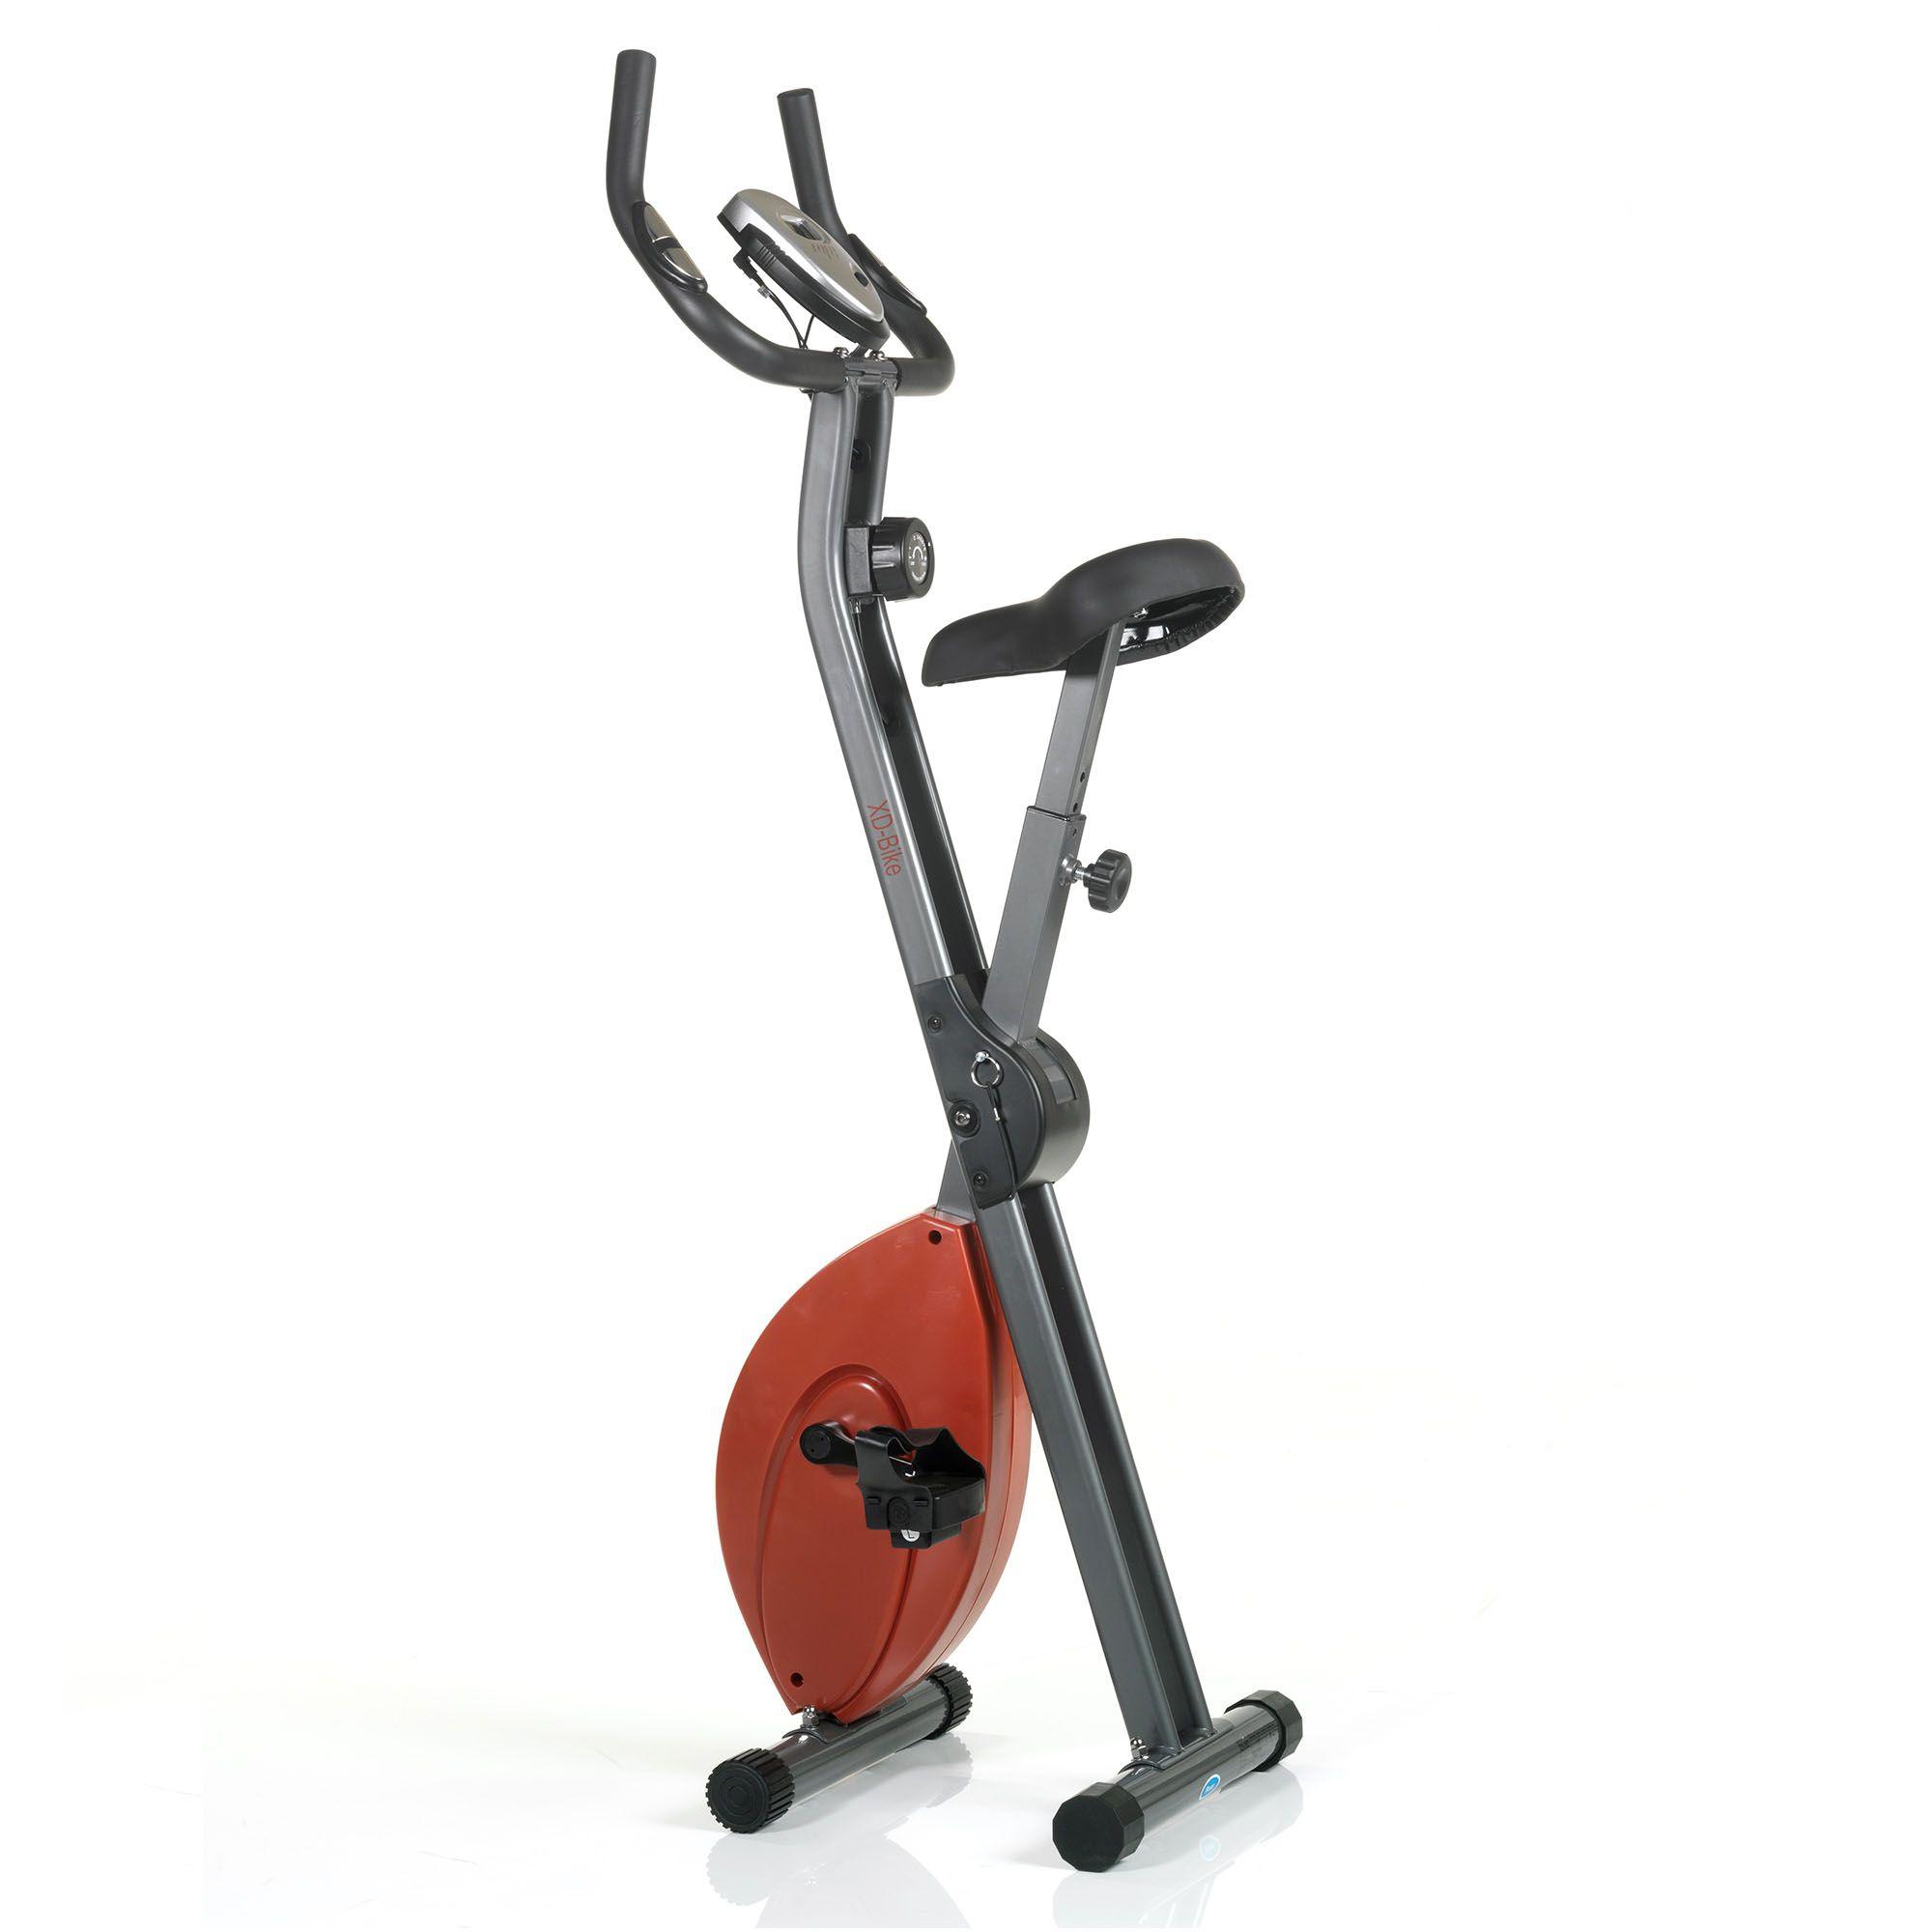 DKN Folding XD Exercise Bike